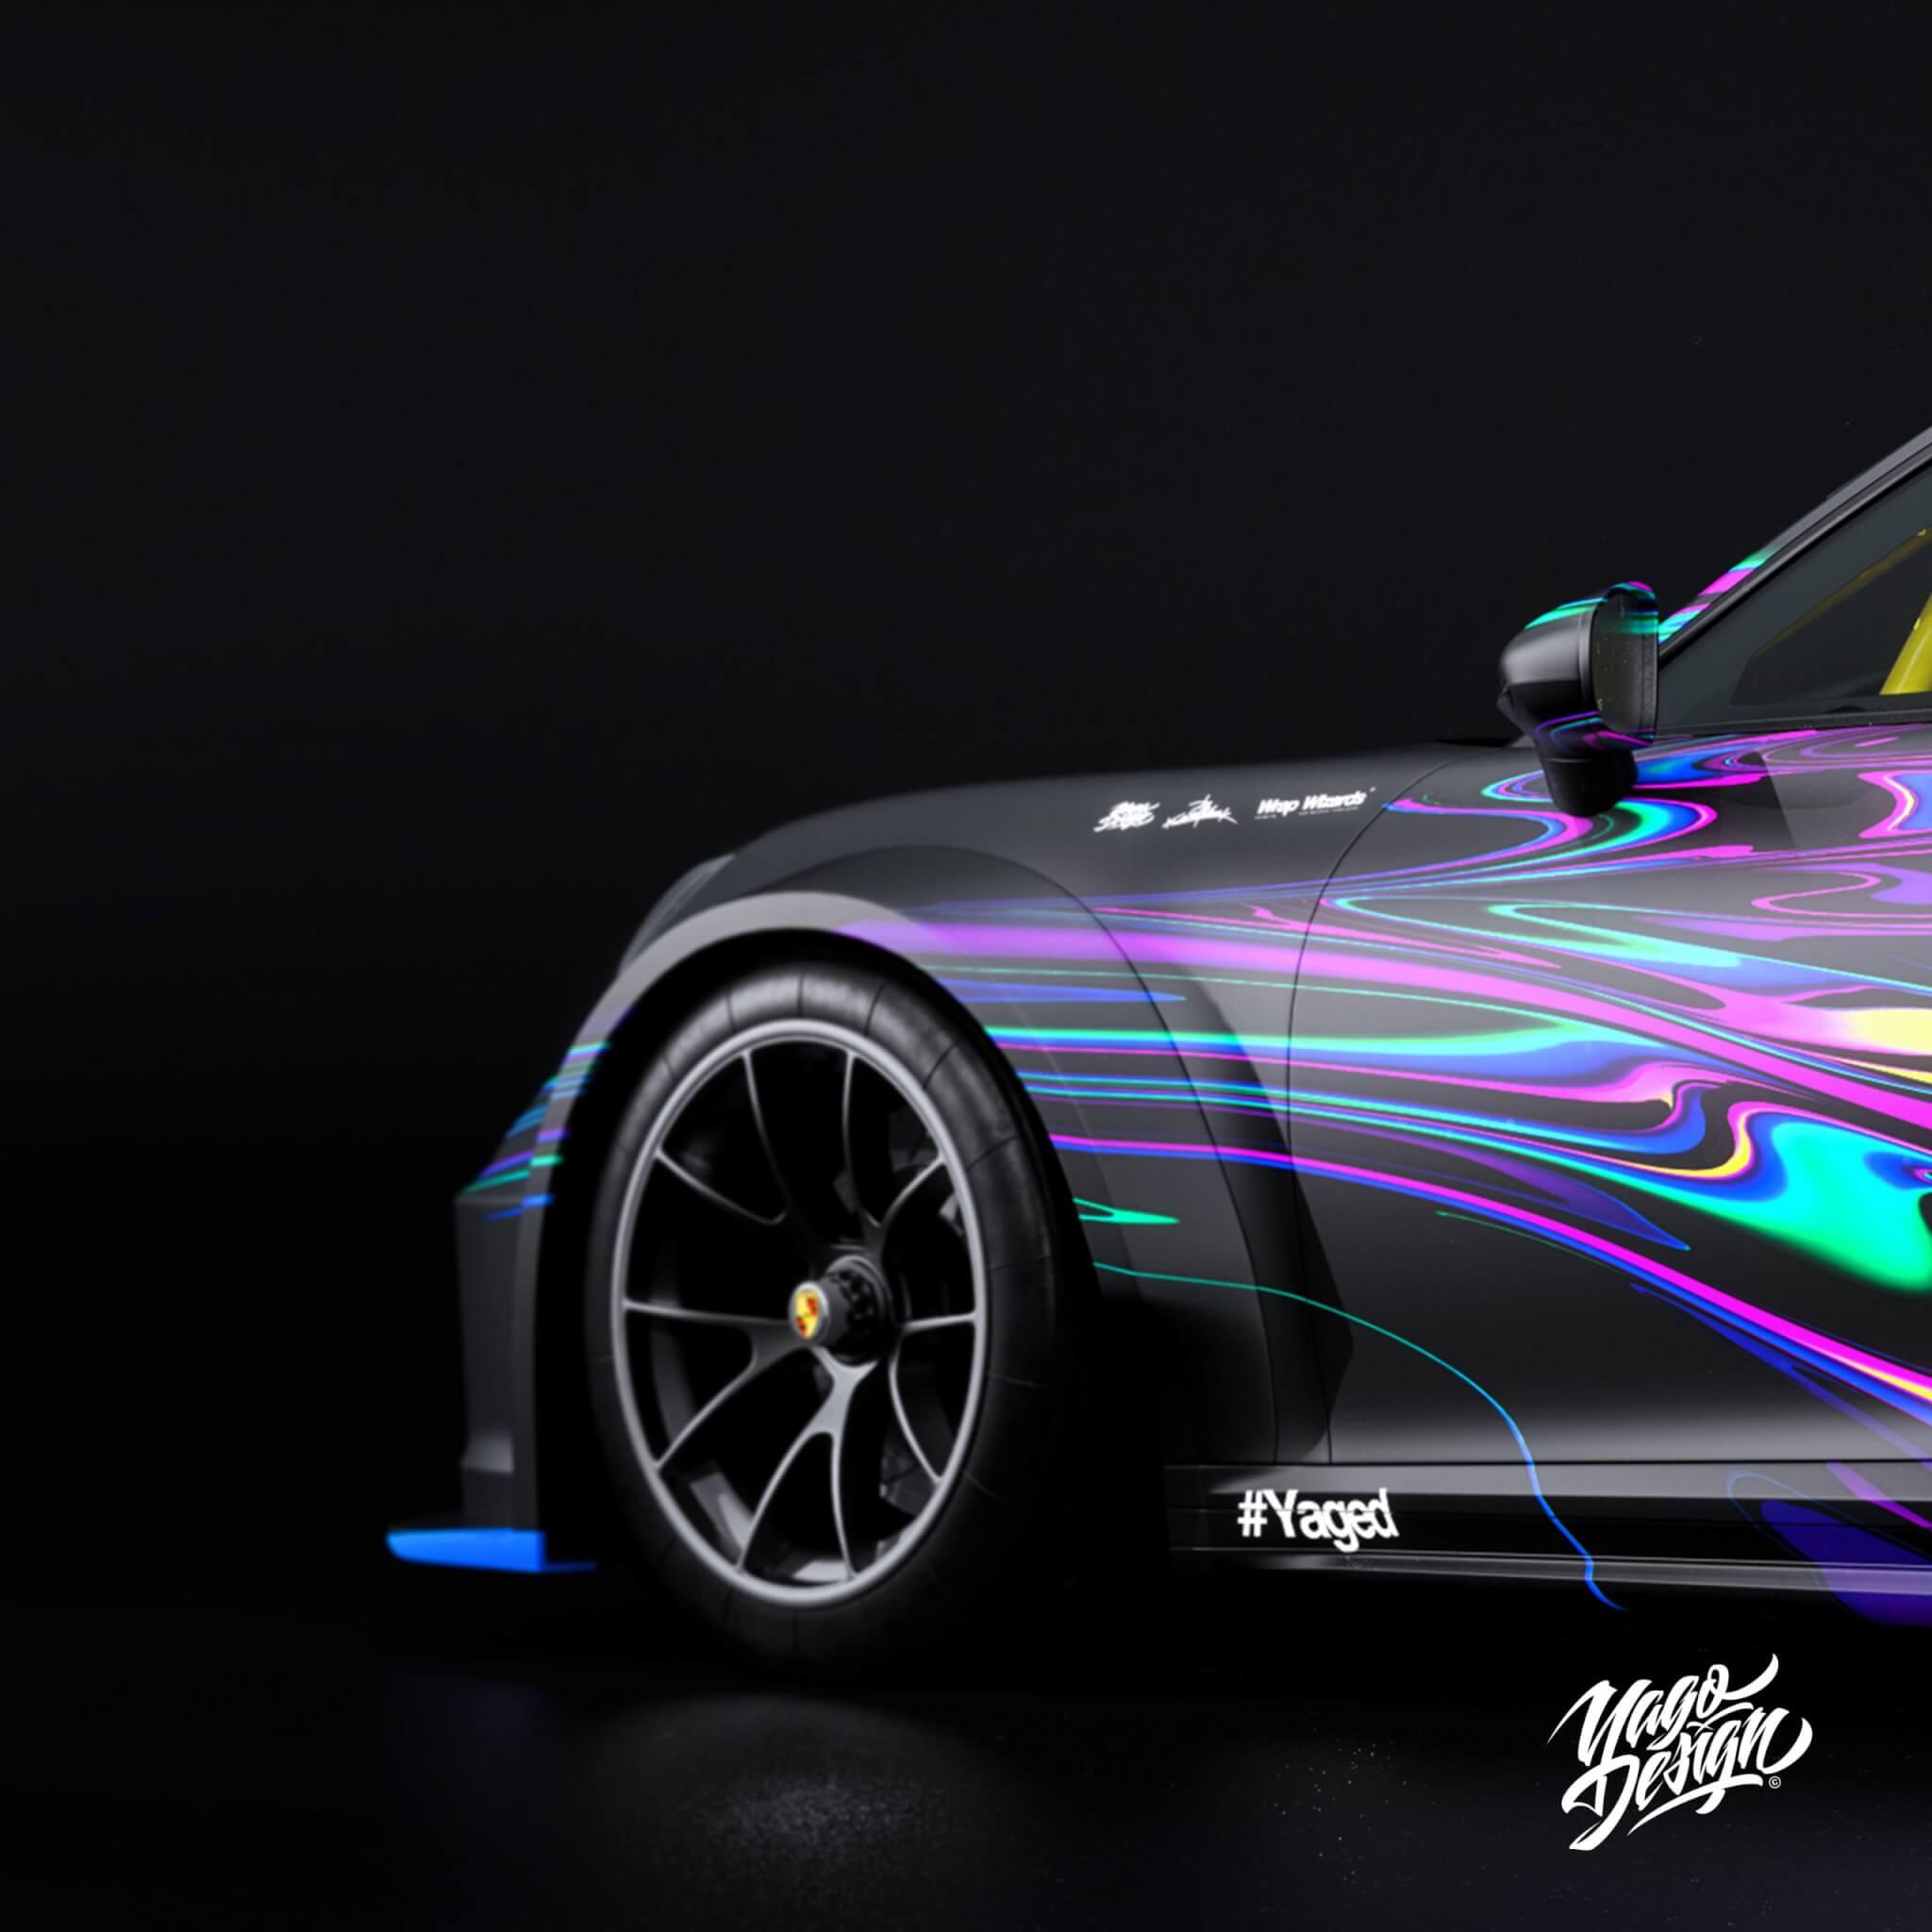 Porsche-911-gt3-rs-Yagodesign-3